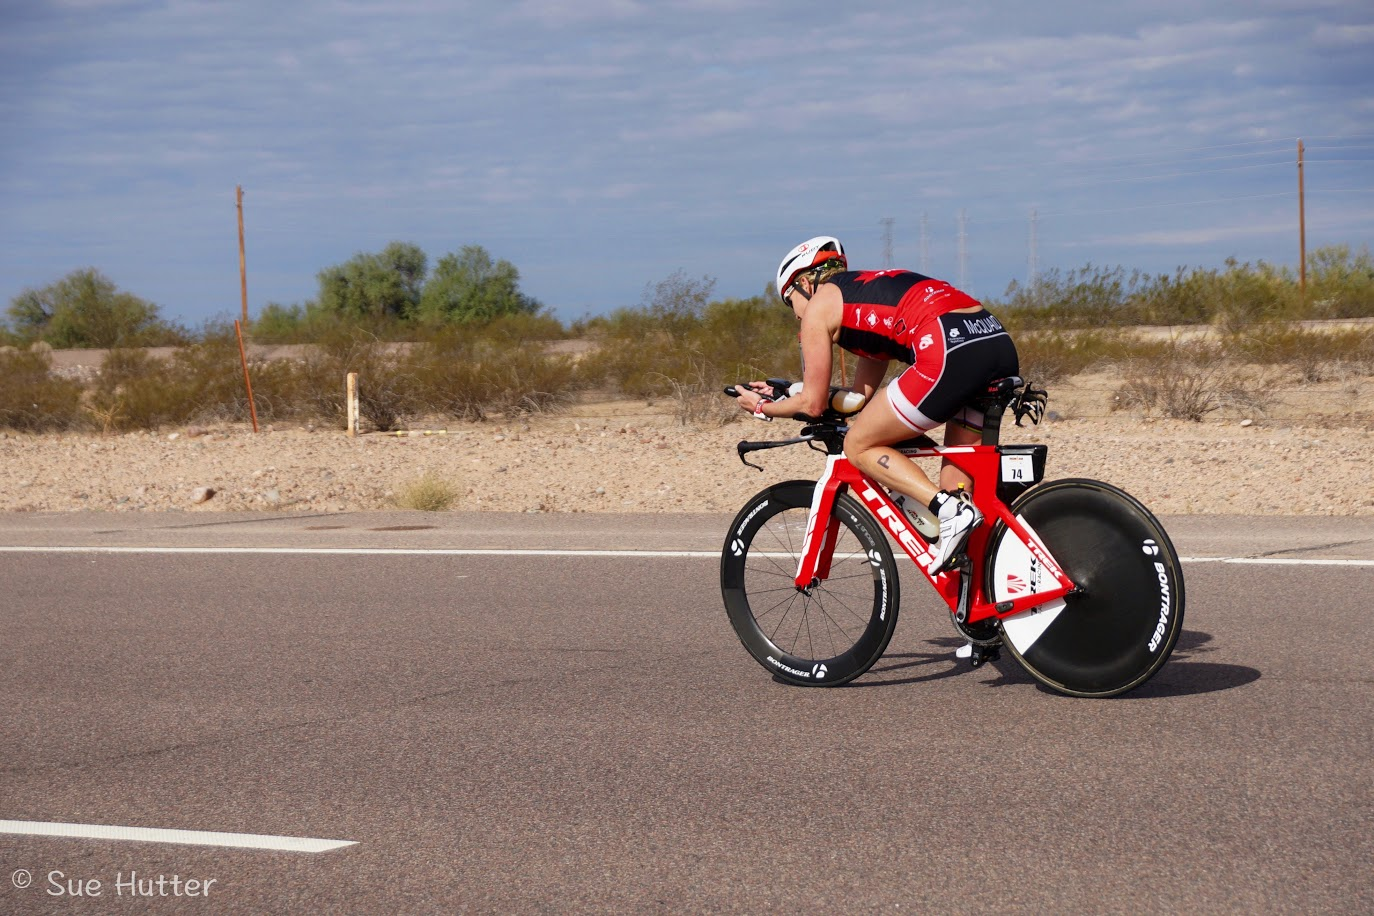 Sue Hutter photographer captures melanie Mcquaid racing Ironman Arizona on Bontrager wheels